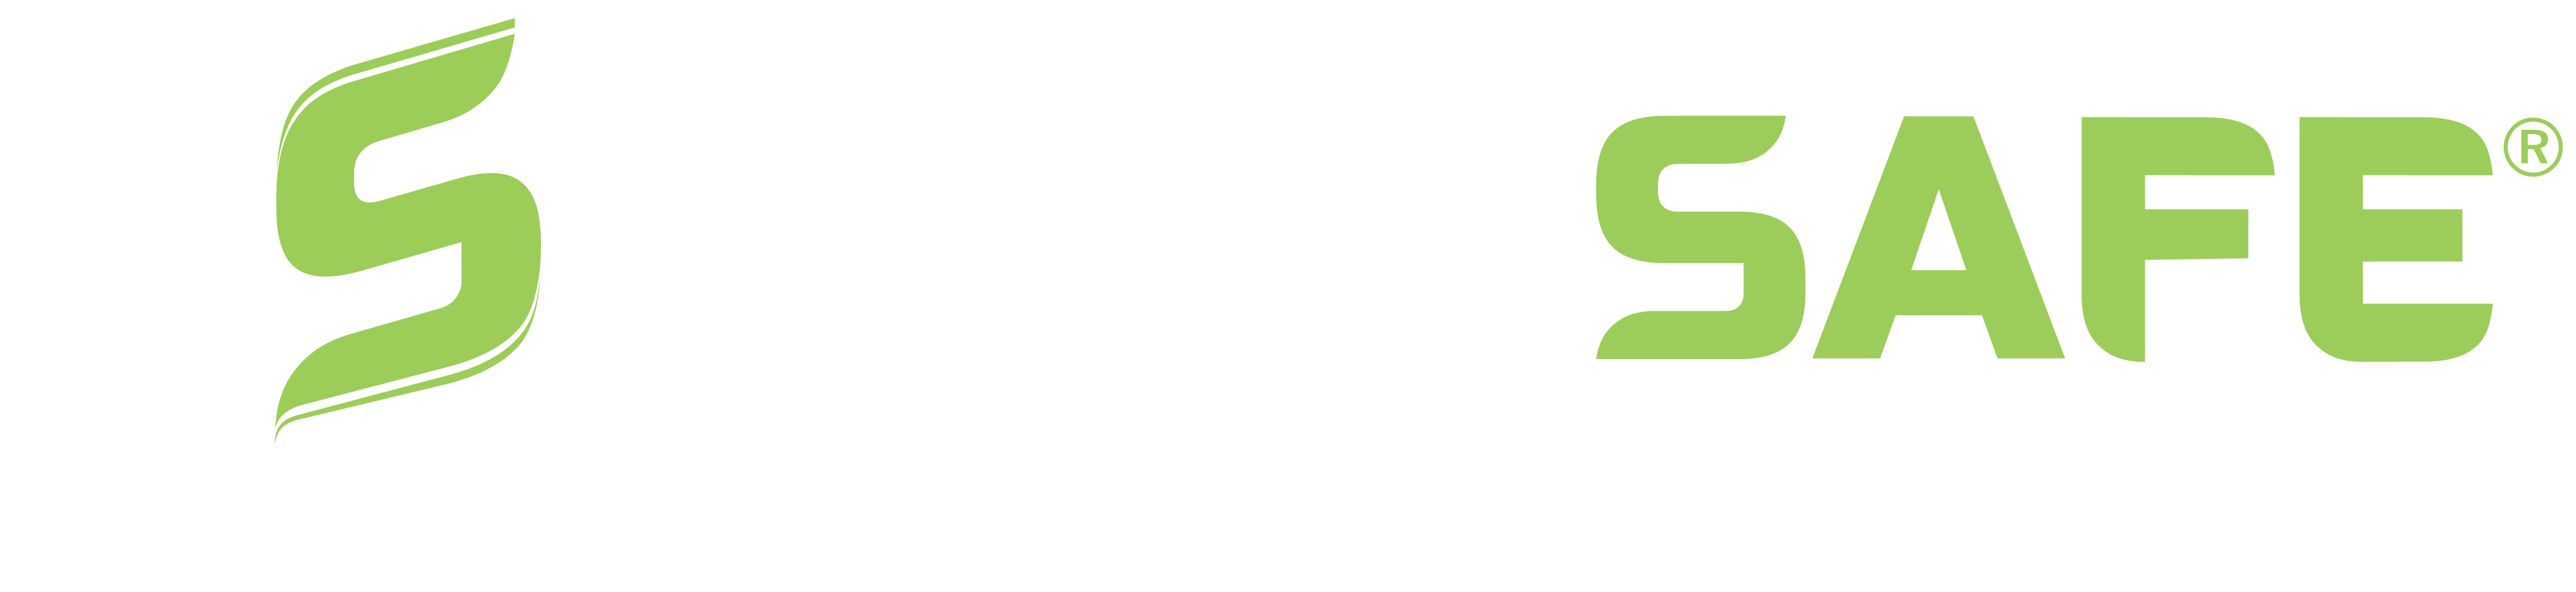 Foodsafe Lubes